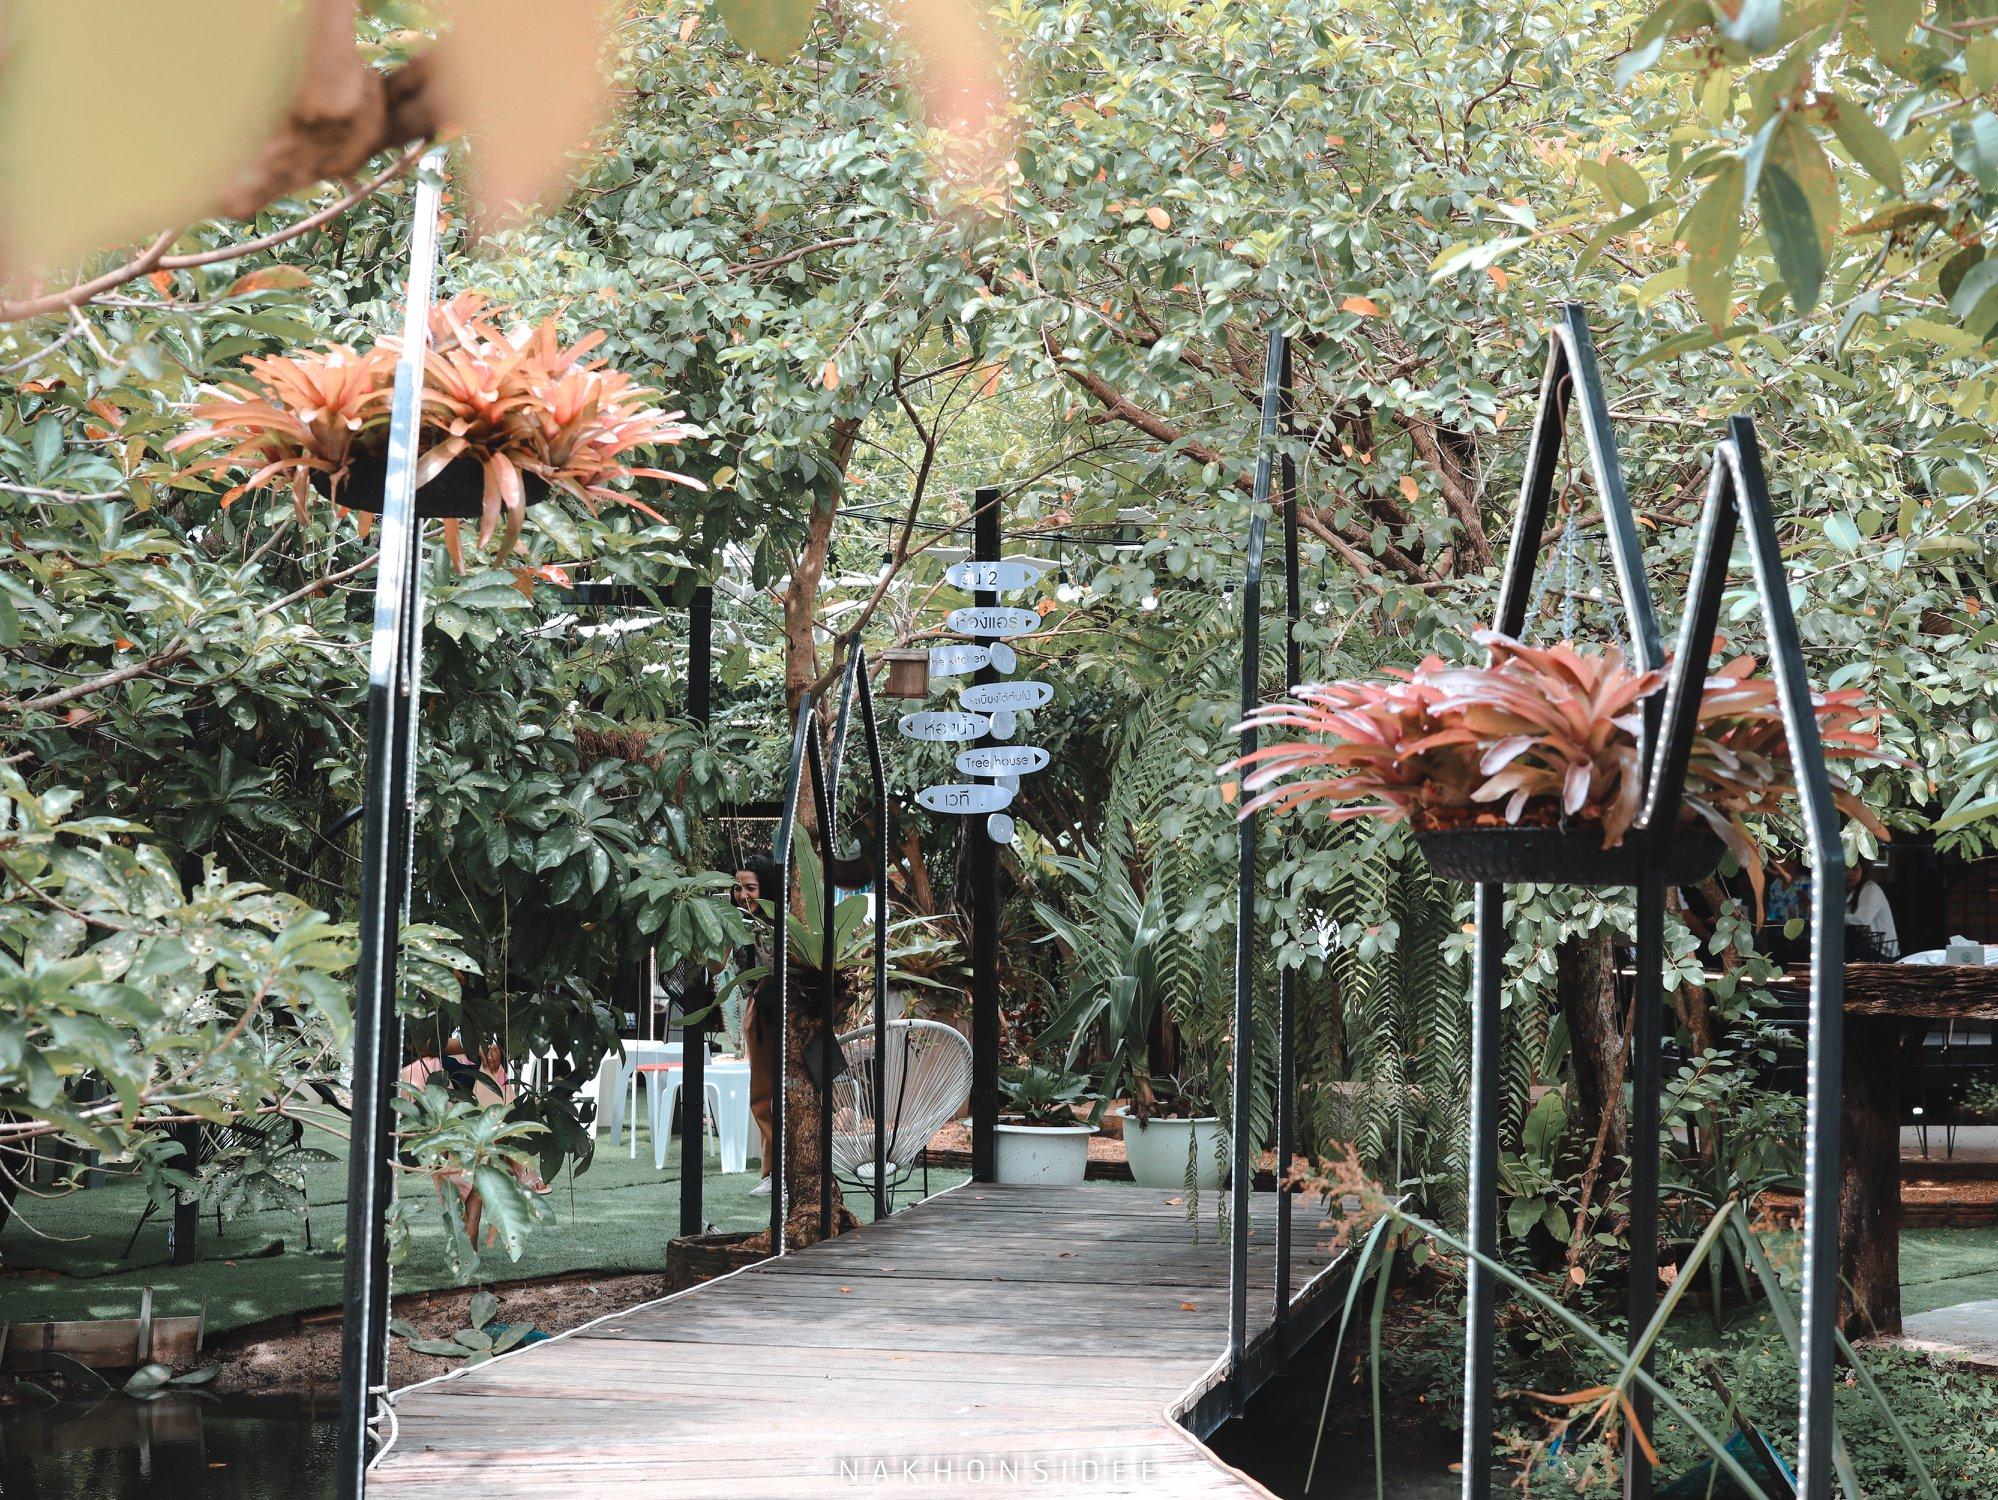 treestation,ร้านอาหาร,คาเฟ่,กลางป่า,อร่อย,ของกิน,นครศรีธรรมราช